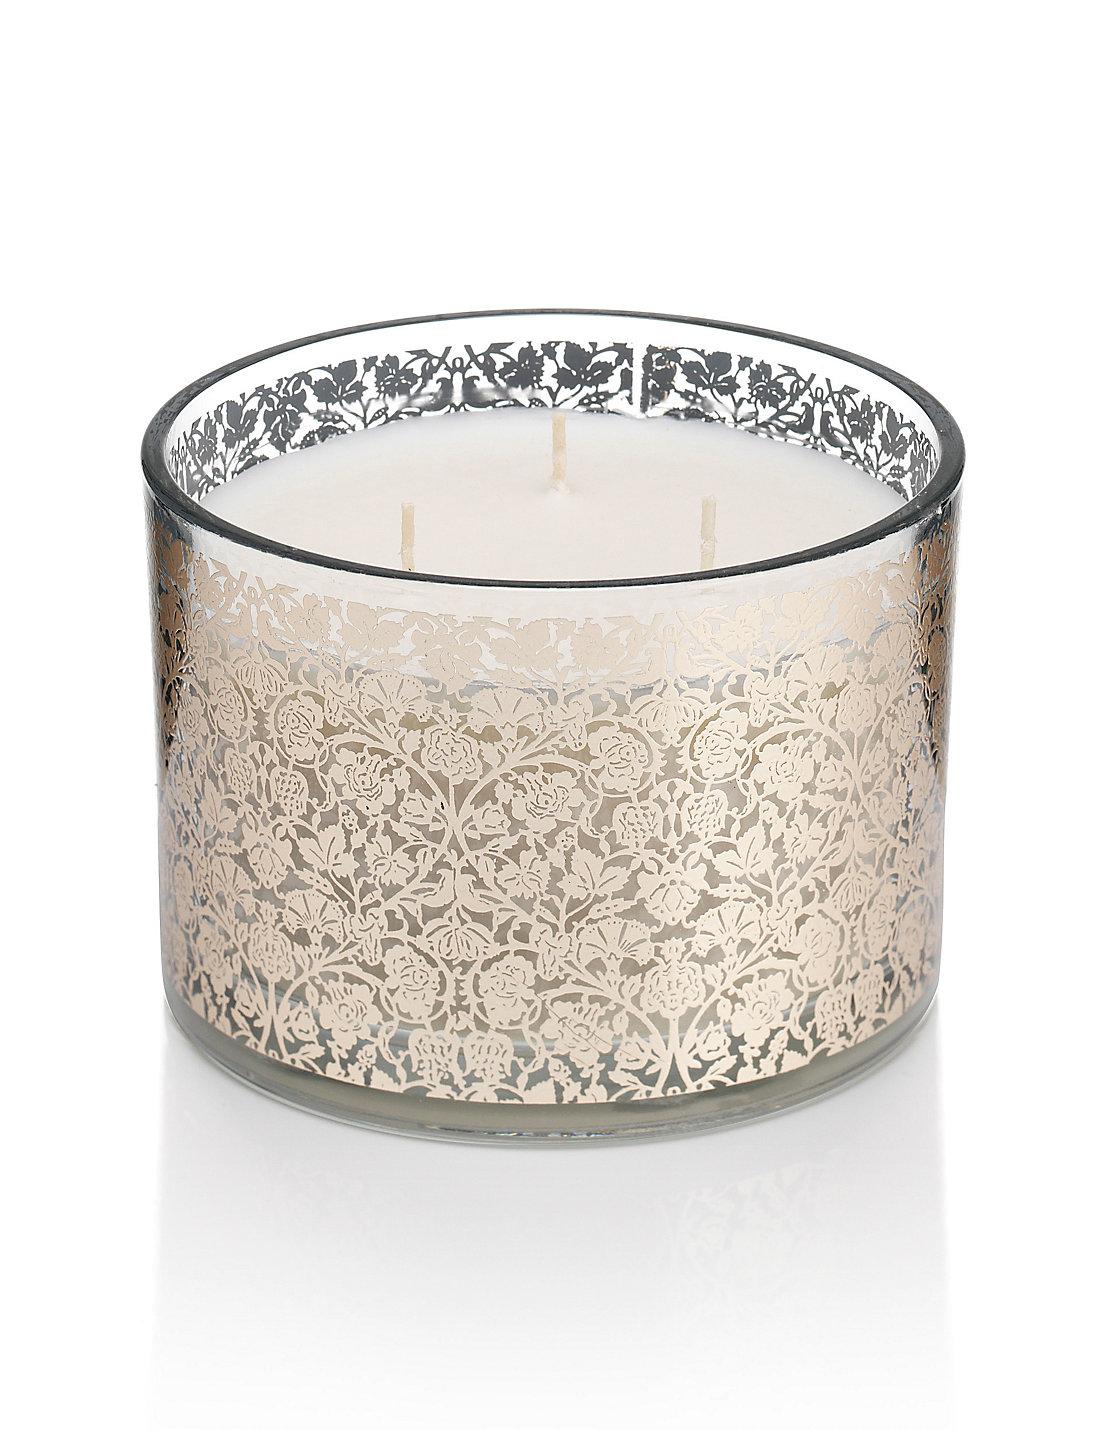 Frankincense & Myrrh Scented Large Filled Candle   M&S